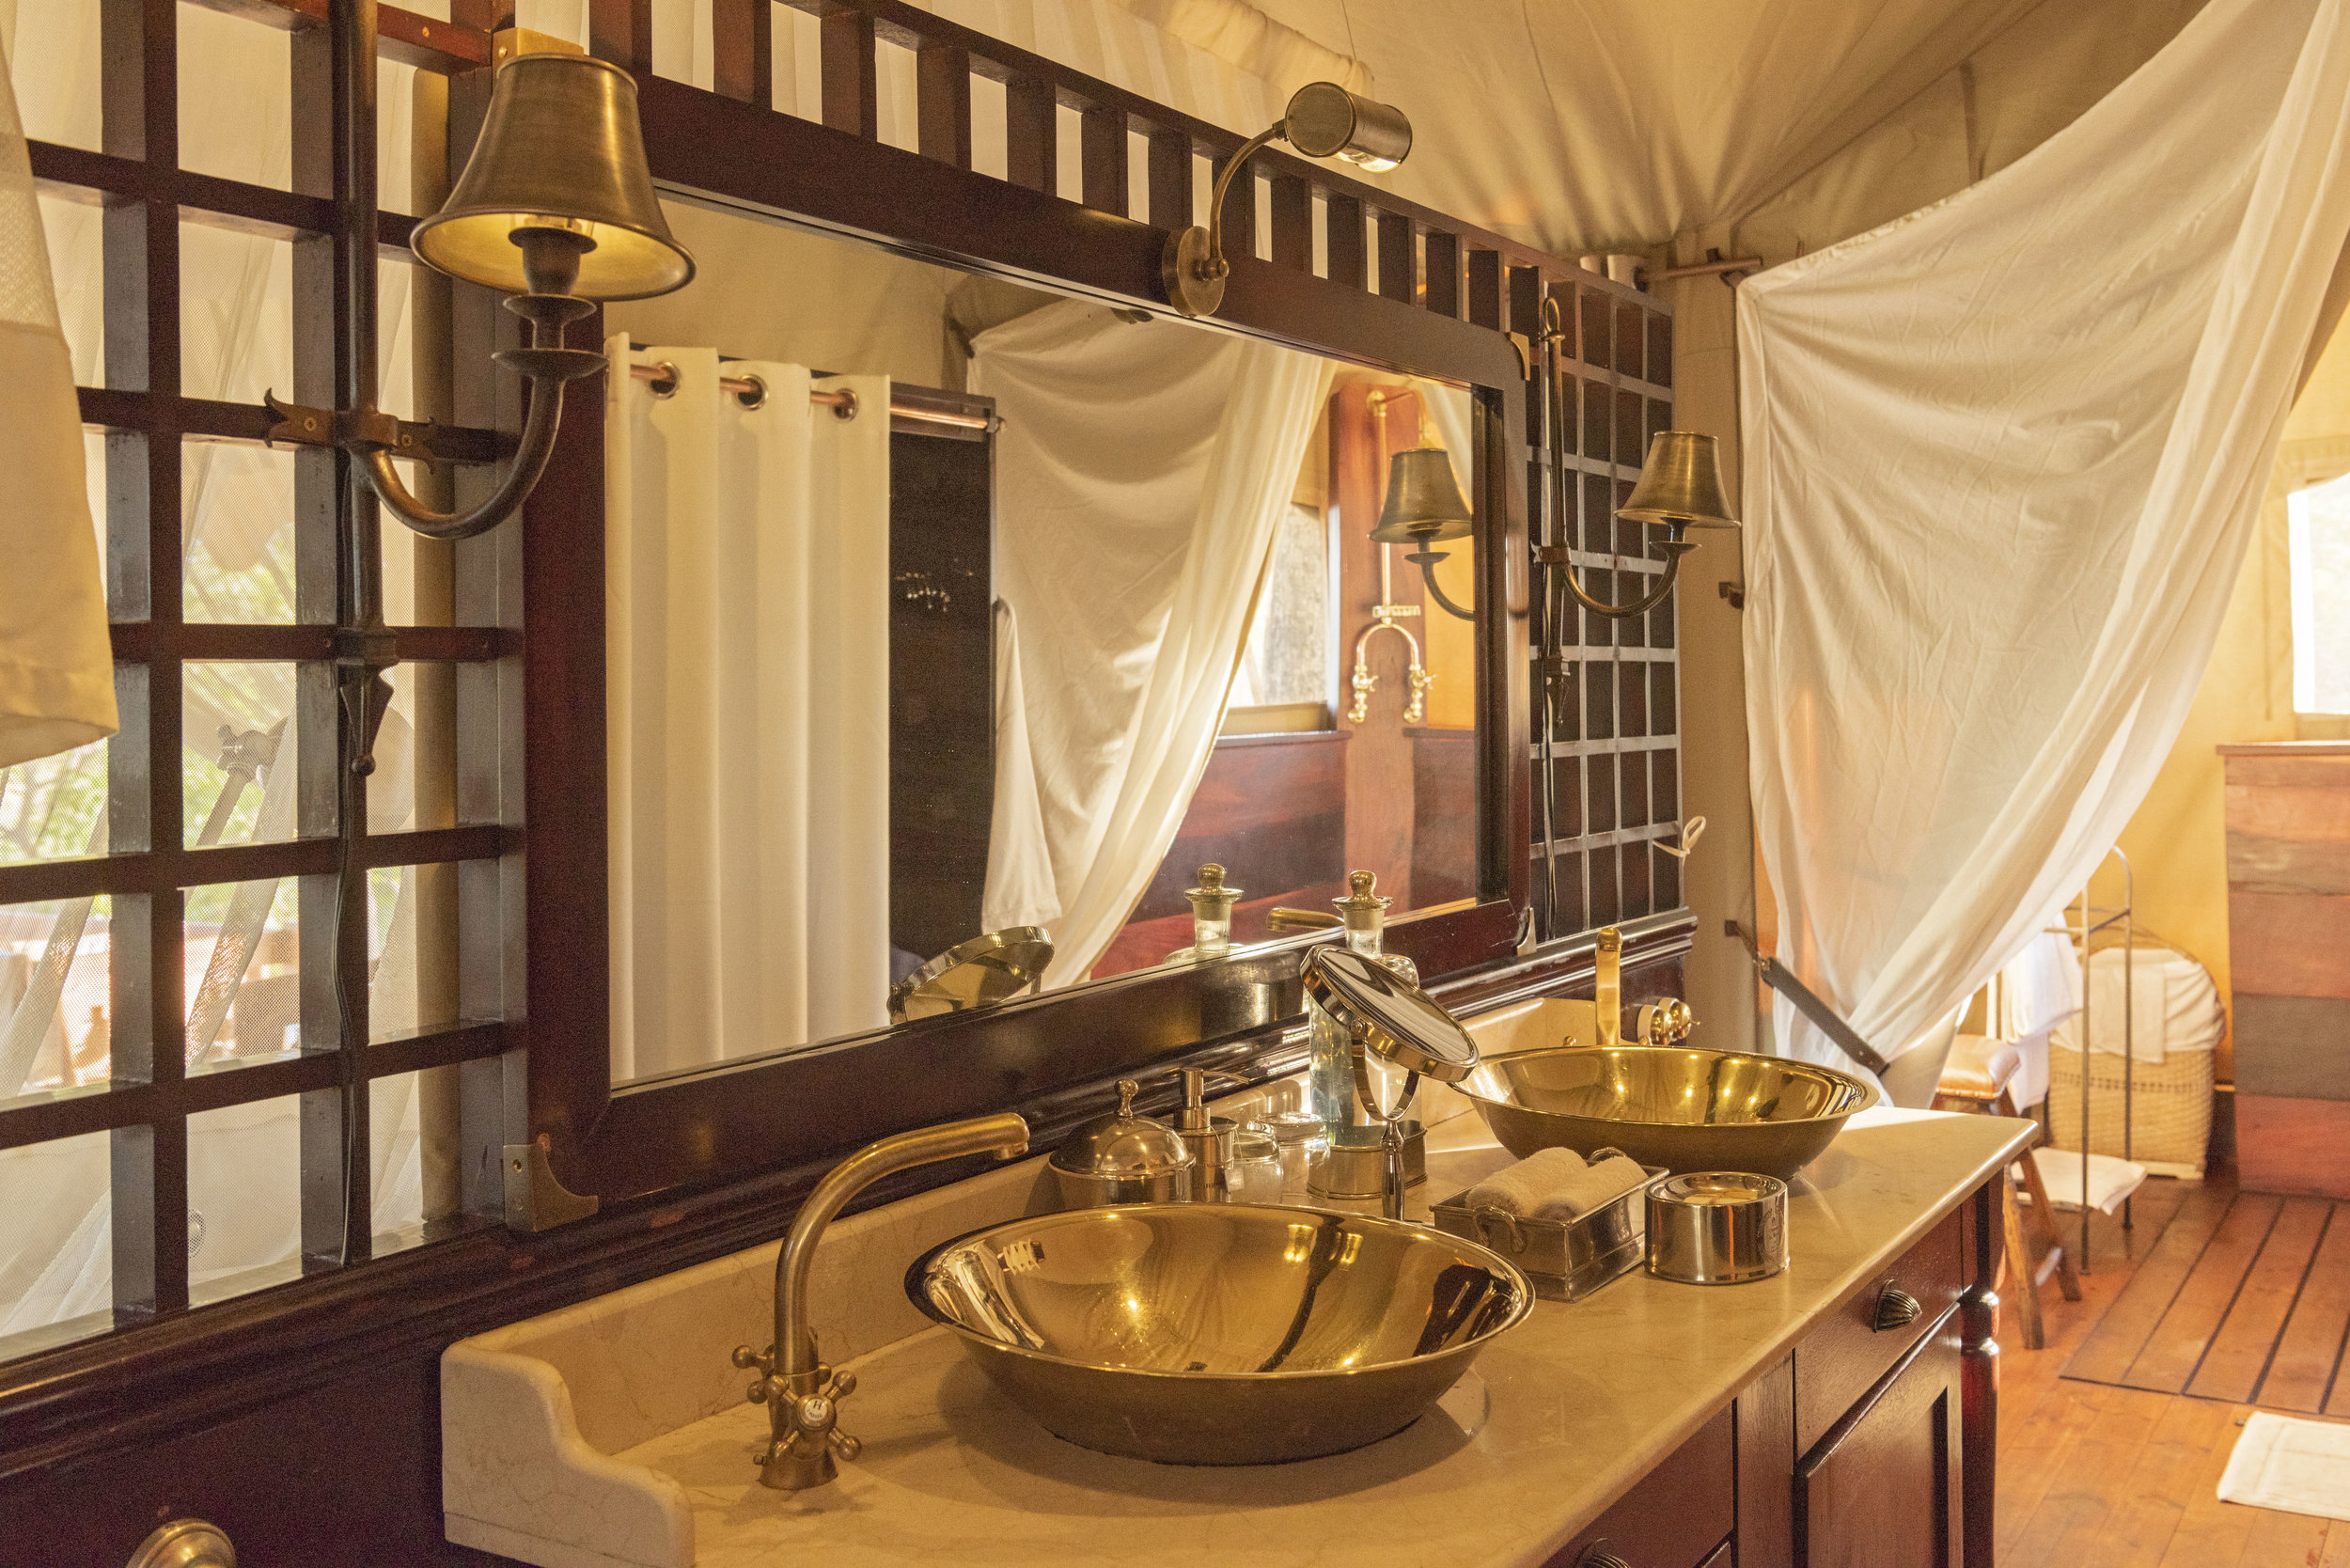 dubaexplorerscamp_guestbathroomvanity_davidrogers.jpg